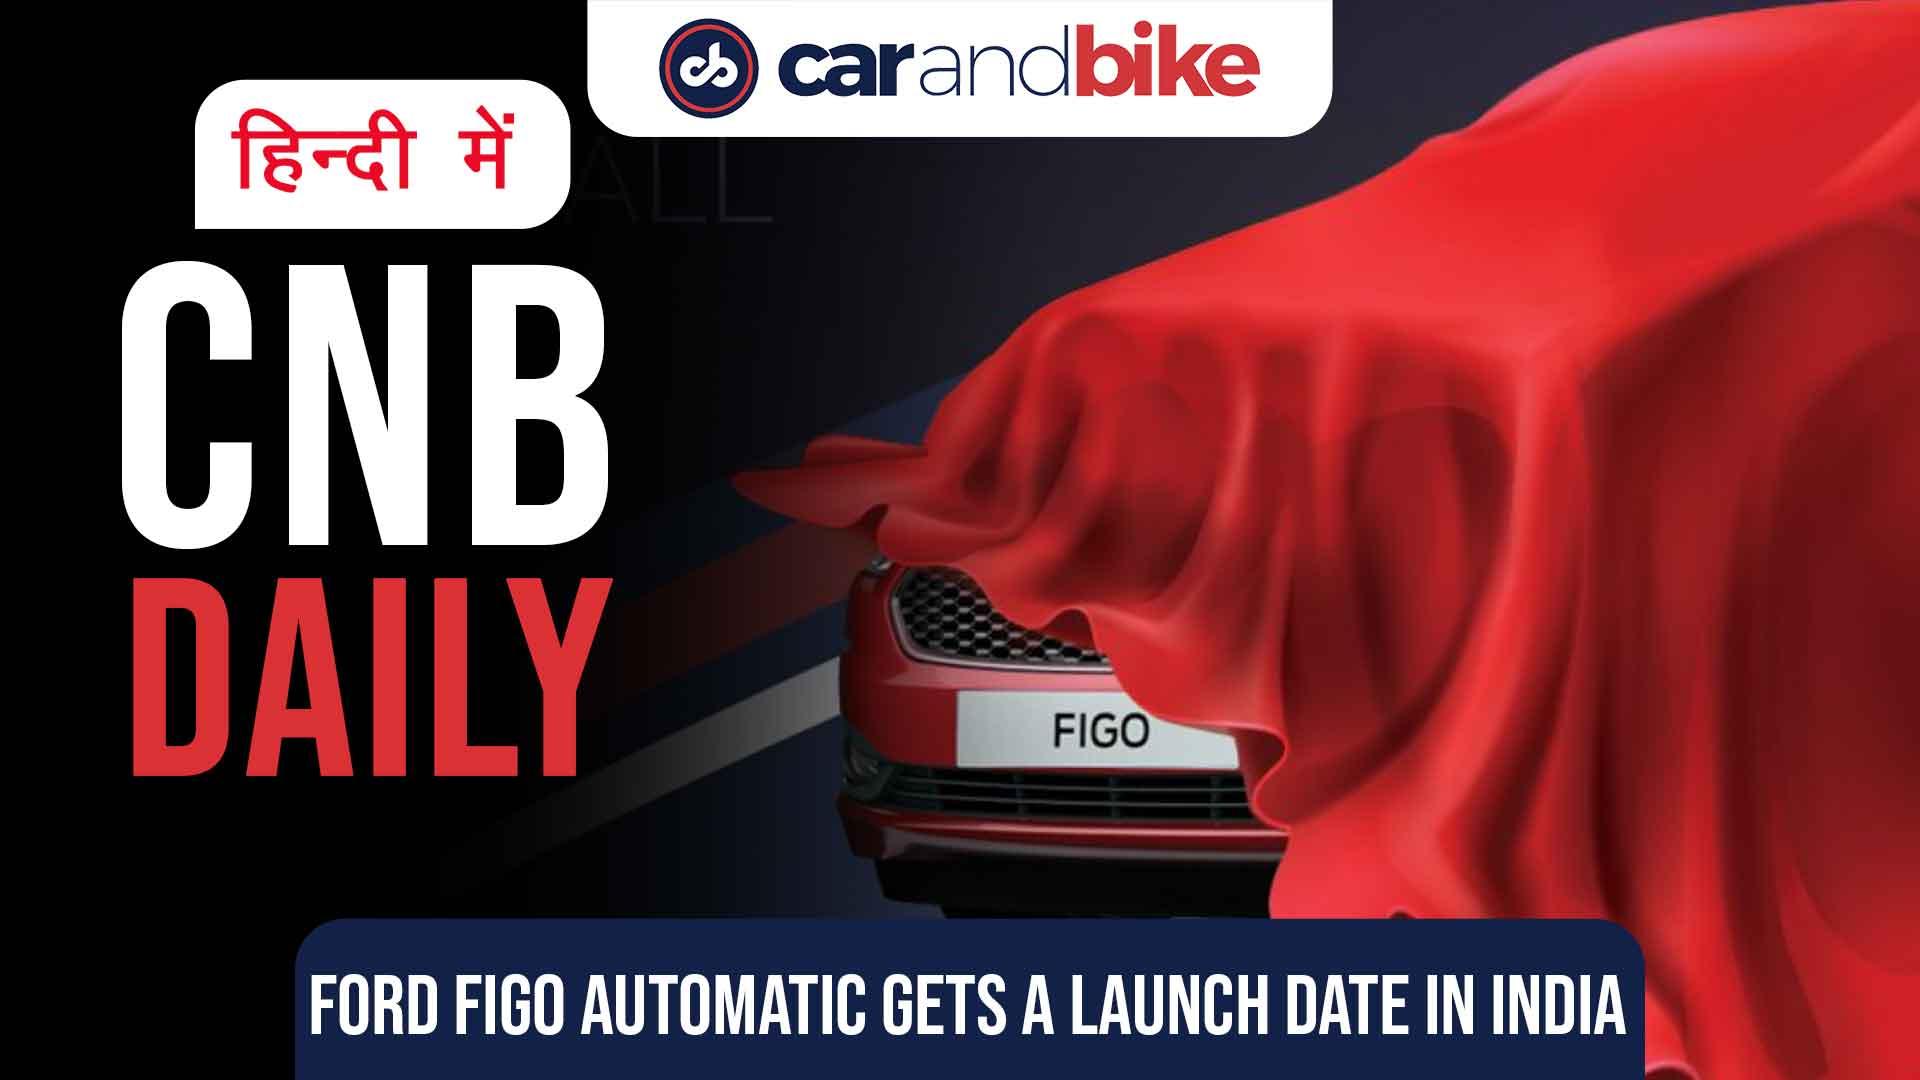 फोर्ड फीगो ऑटोमैटिक 22 जुलाई को होगी लॉन्च